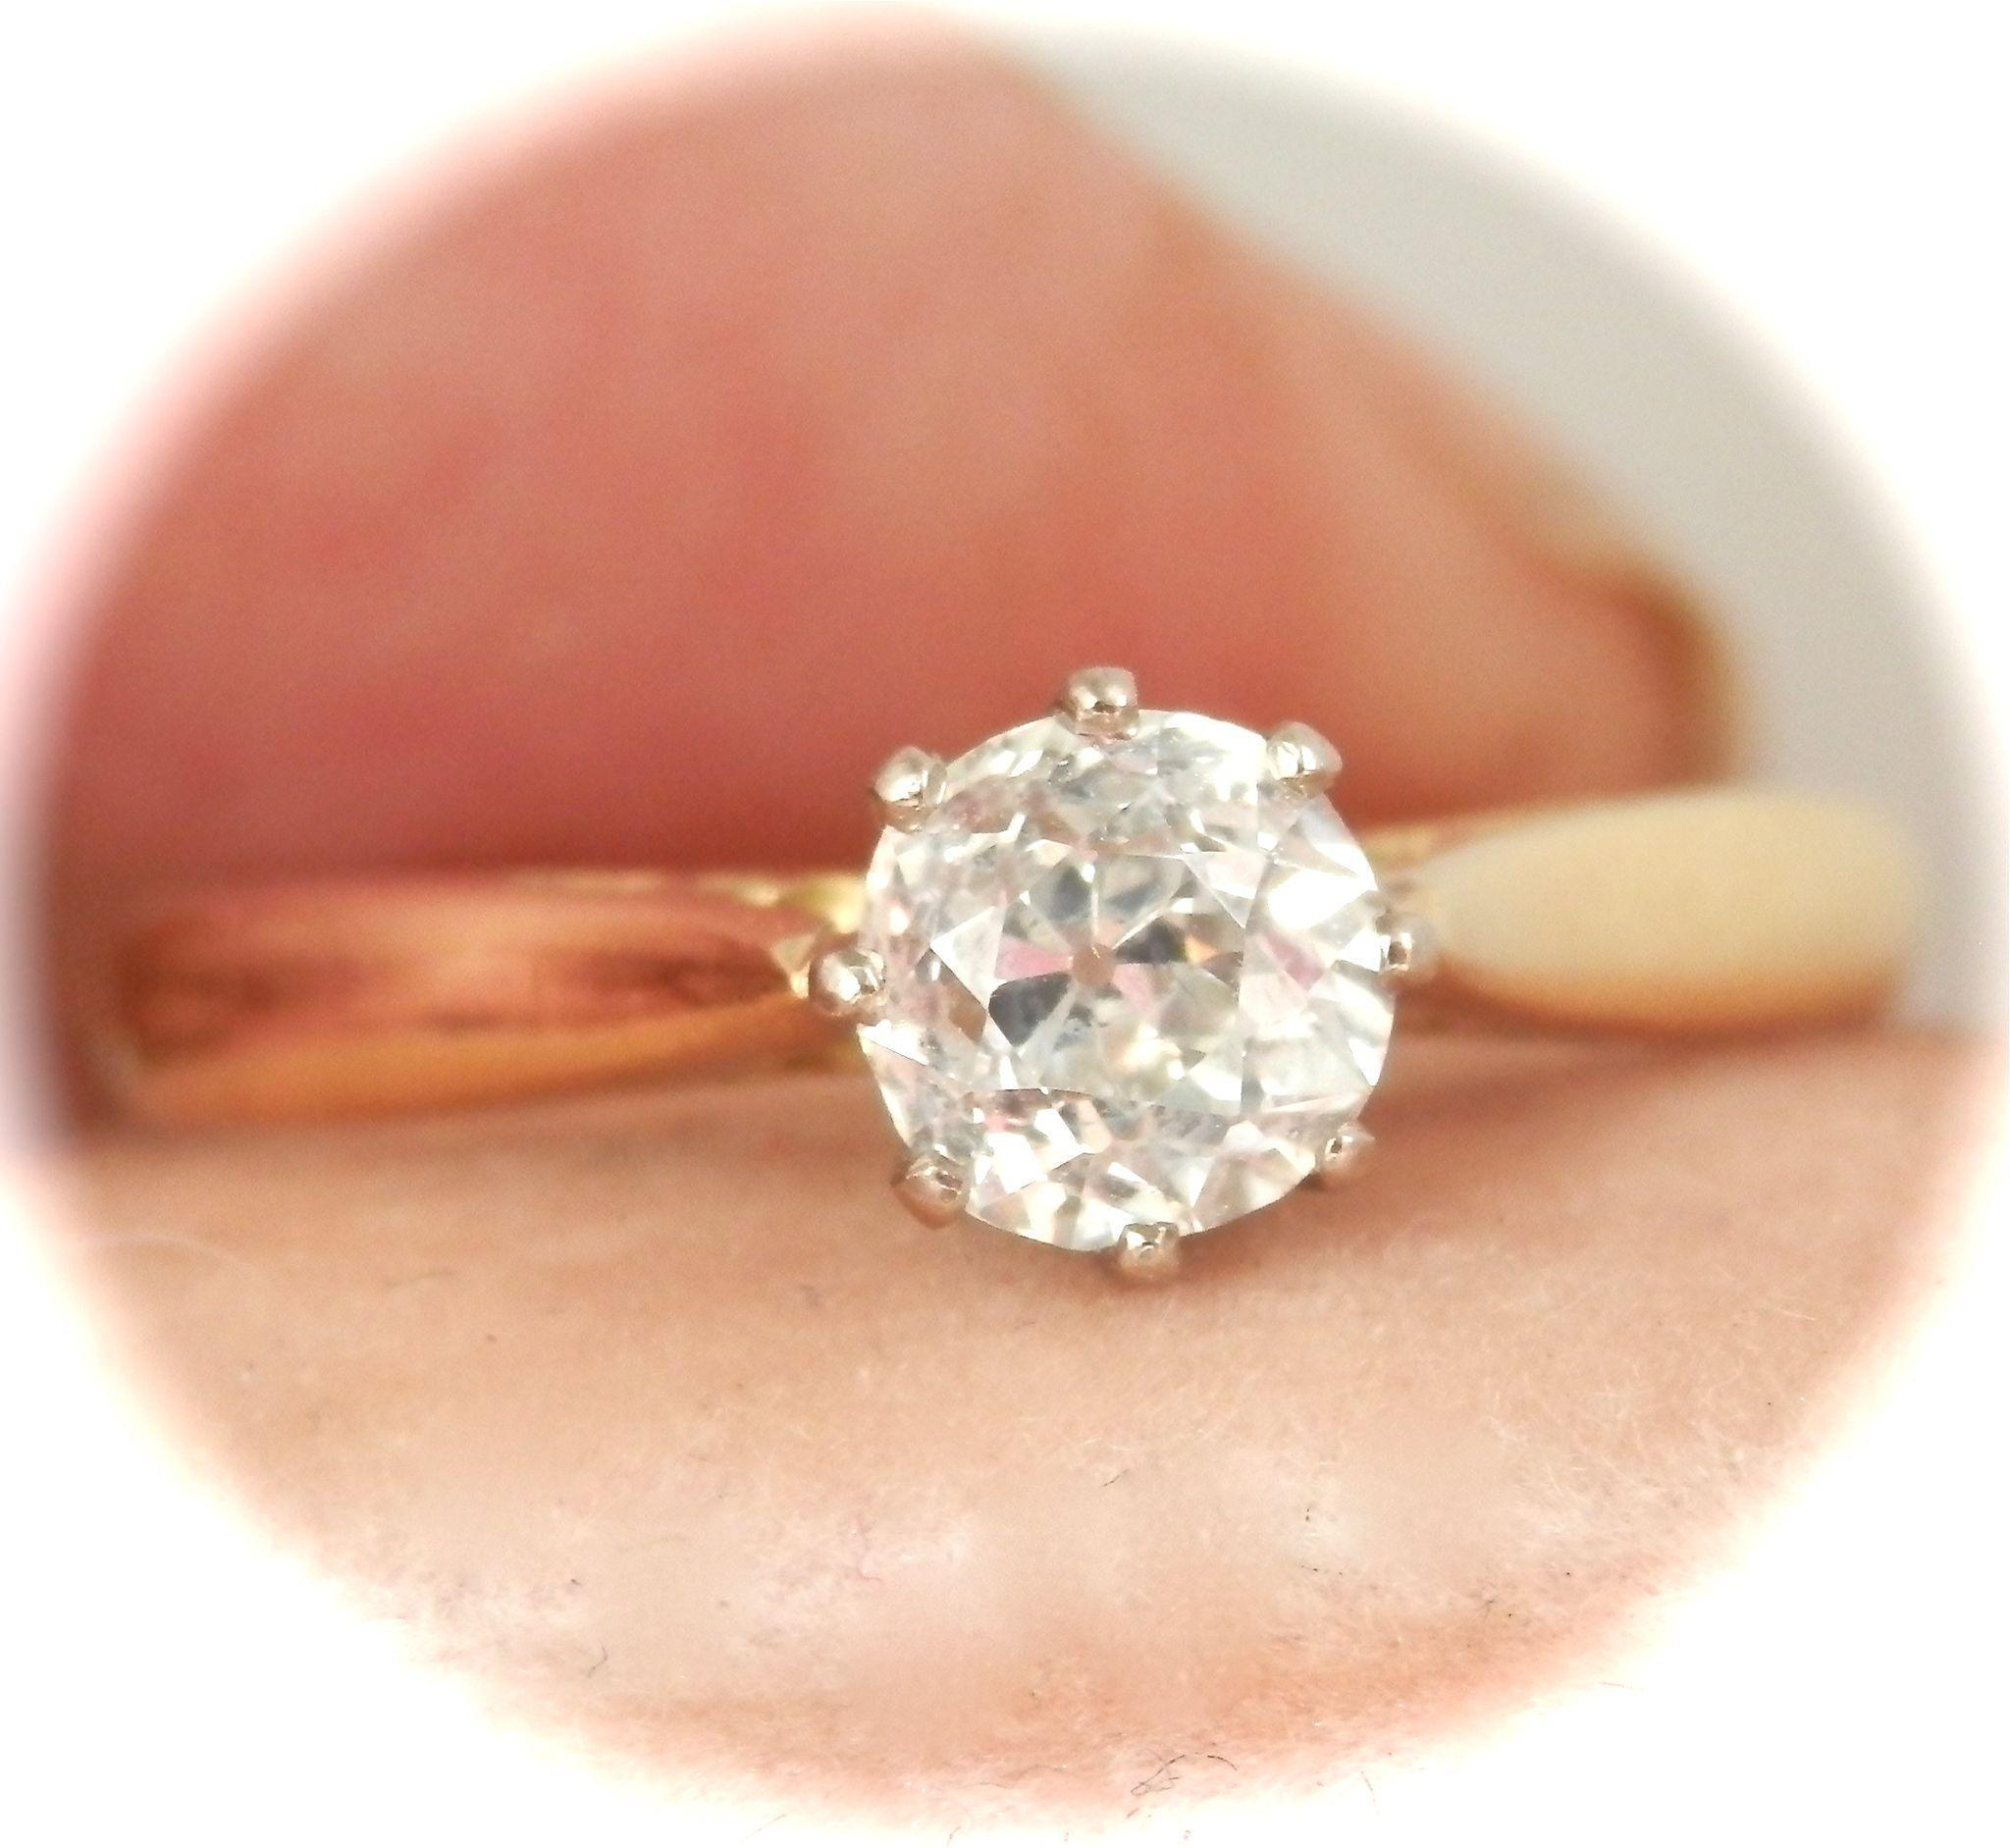 Wonderful English 18K Y/Gold 0.55 ct. Diamond Solitaire Vintage Ring